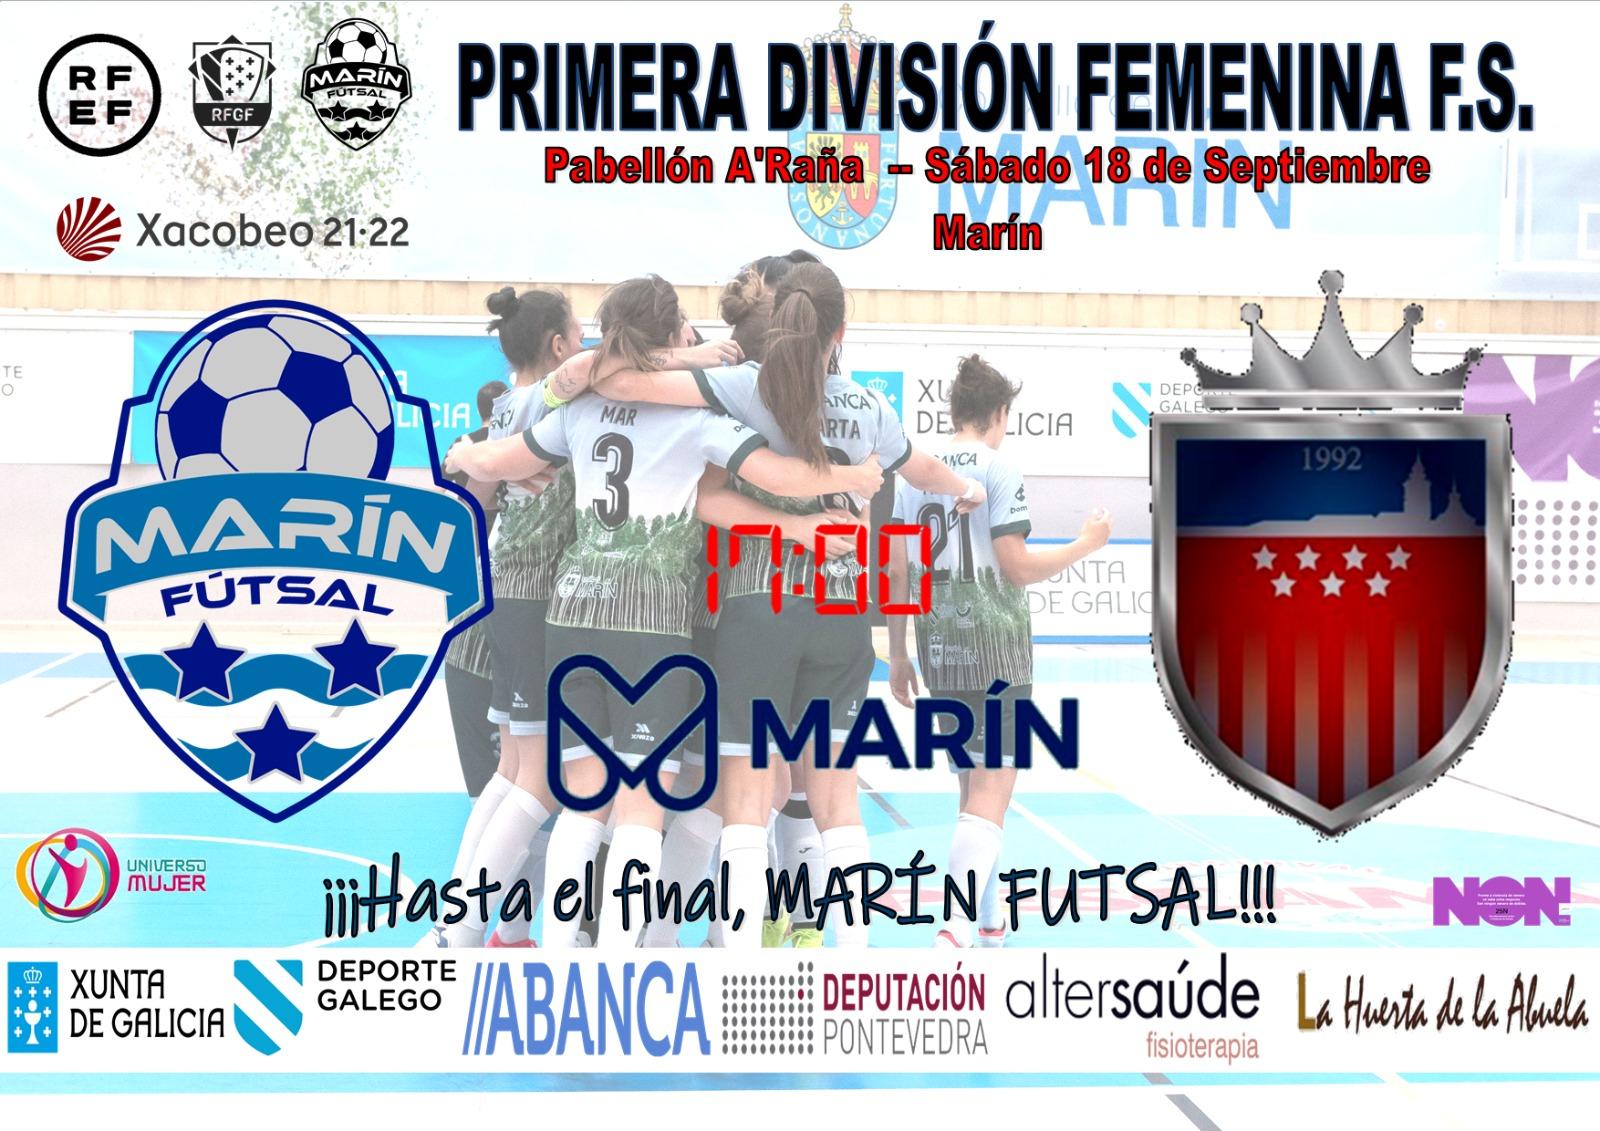 Previa del Partido de Liga: Marín Futsal - Futsi Atco. Navalcarnero. Jornada 1ª